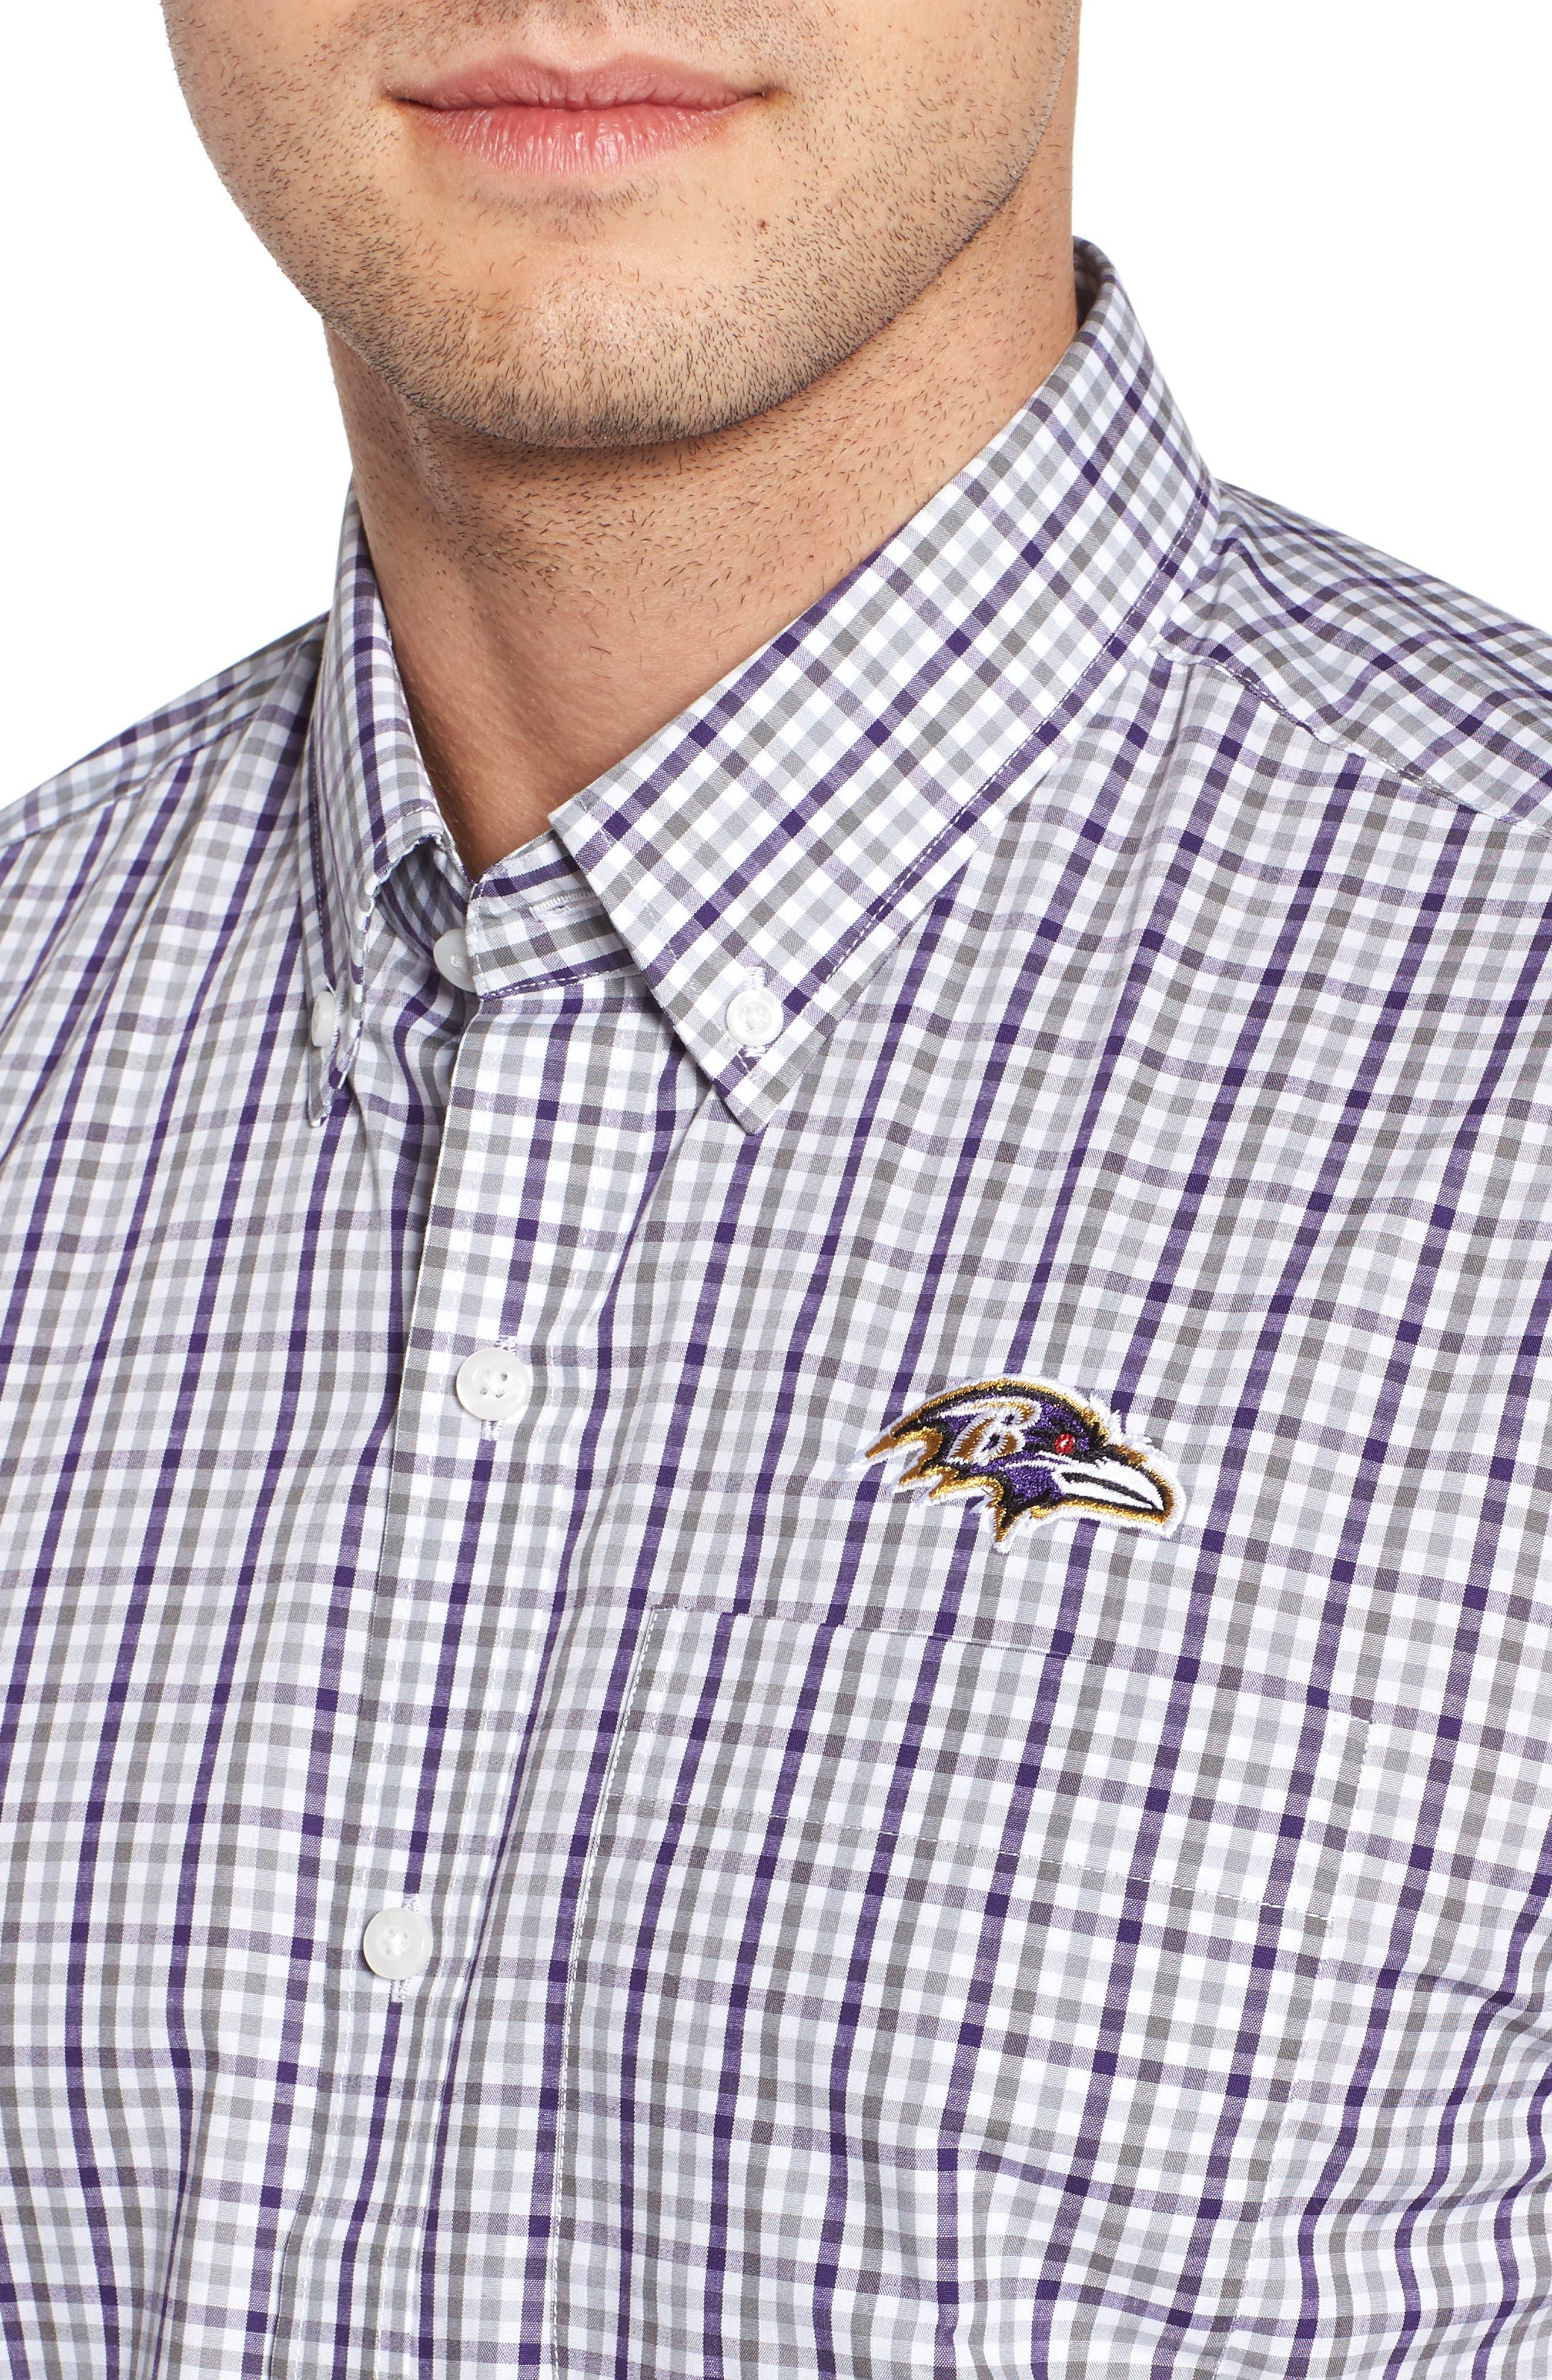 Baltimore Ravens - Gilman Regular Fit Plaid Sport Shirt,                             Alternate thumbnail 4, color,                             541